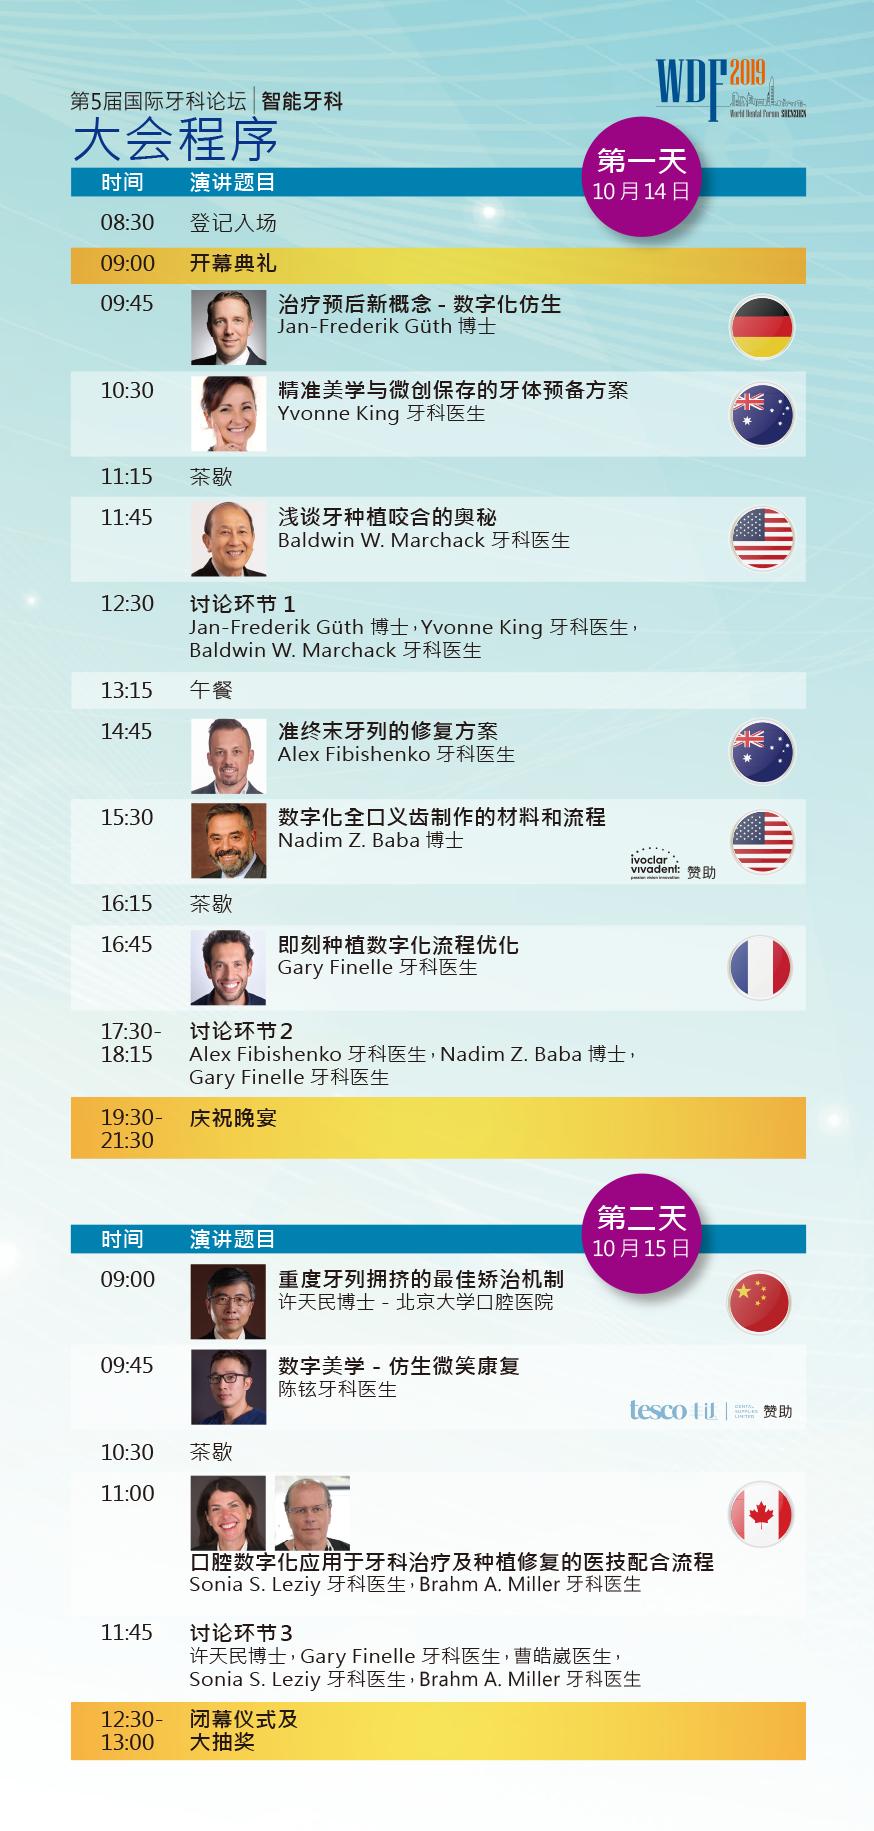 schedule_CN_20190923.png